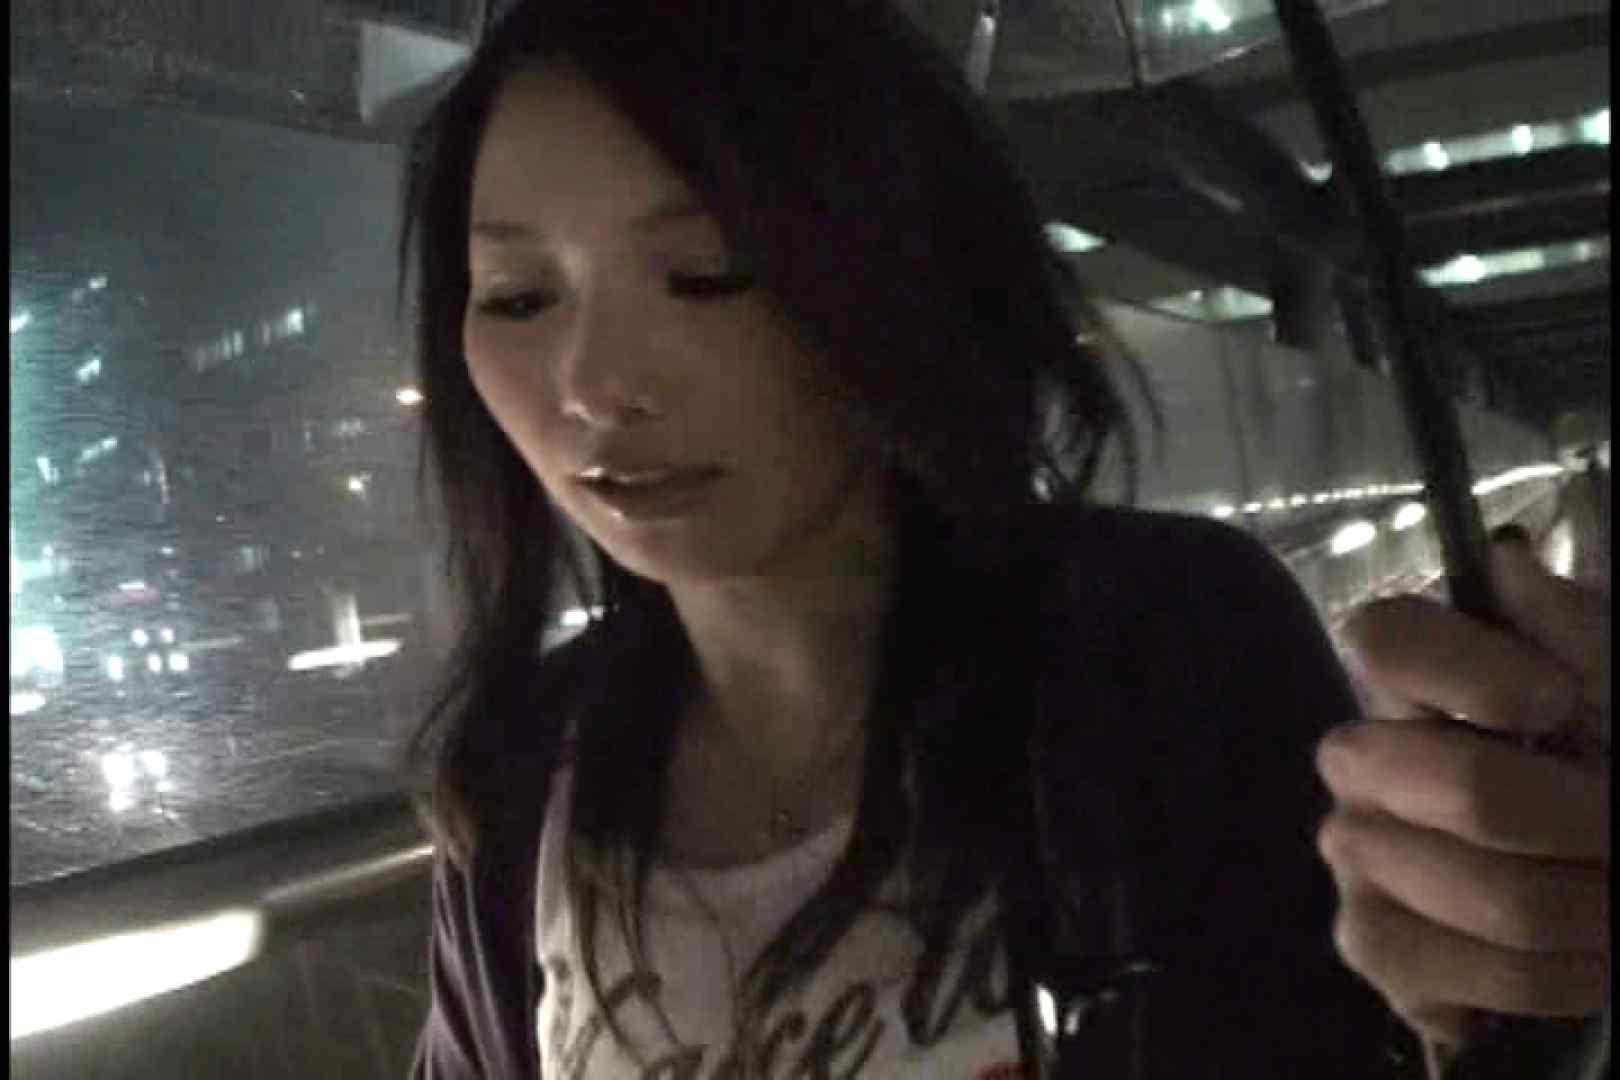 JDハンター全国ツアー vol.045 後編 女子大生のエロ動画 | 0  91PIX 1